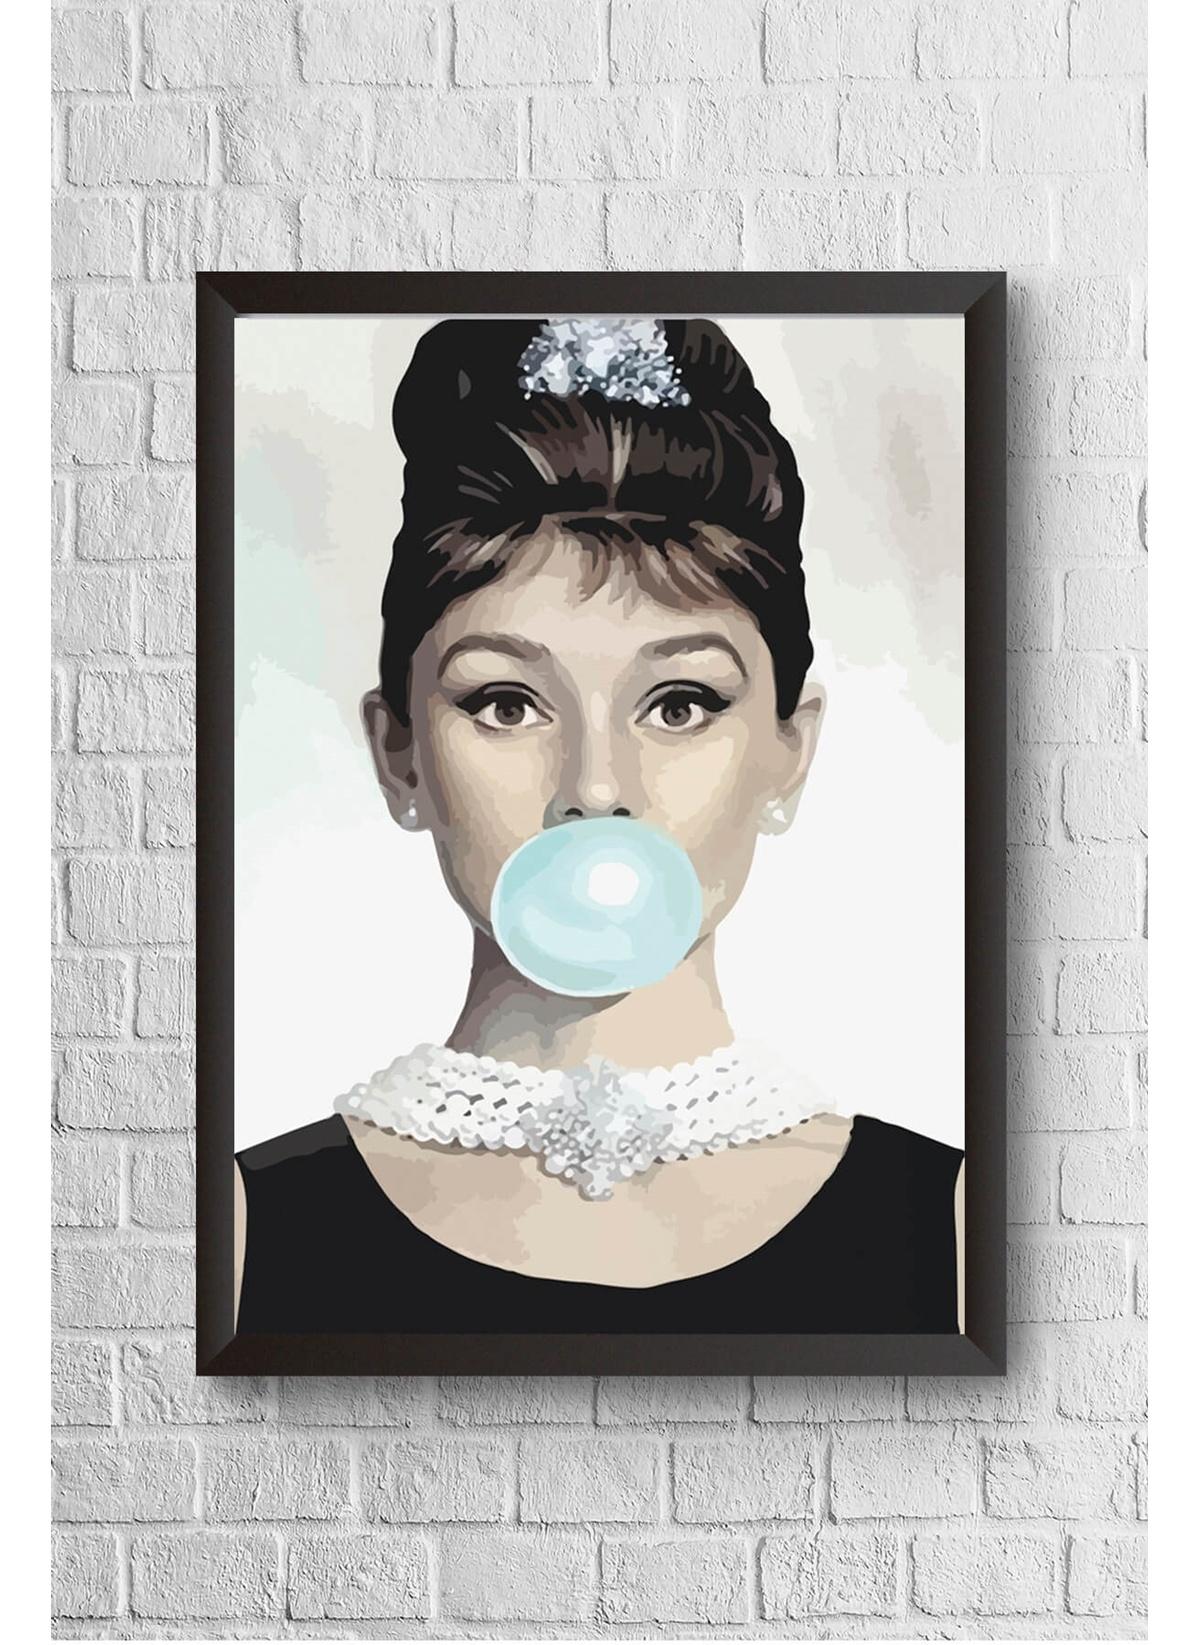 Standart Lyn Home & Decor Audrey Balon Çerçeveli Poster Tablo 23.5X33,5